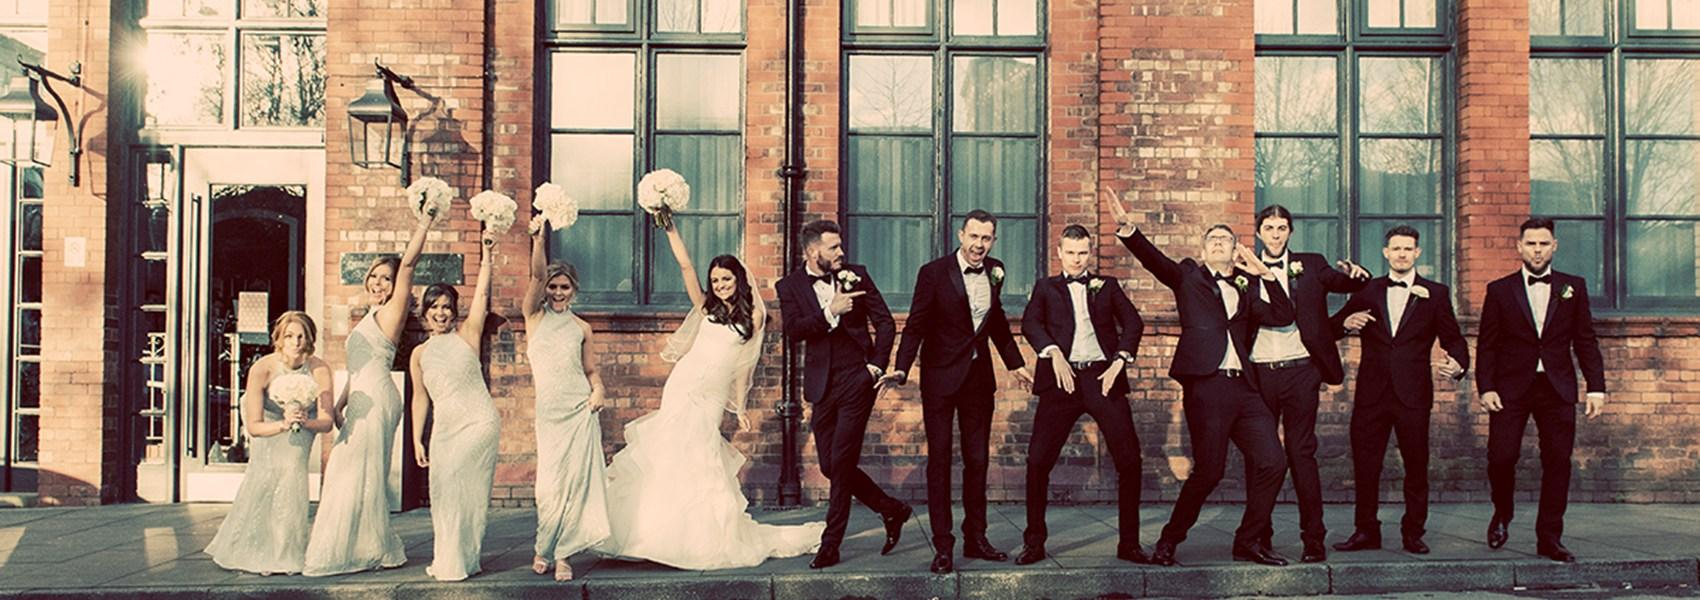 wedding langhe roero matrimonio in langa piemonte.jpeg